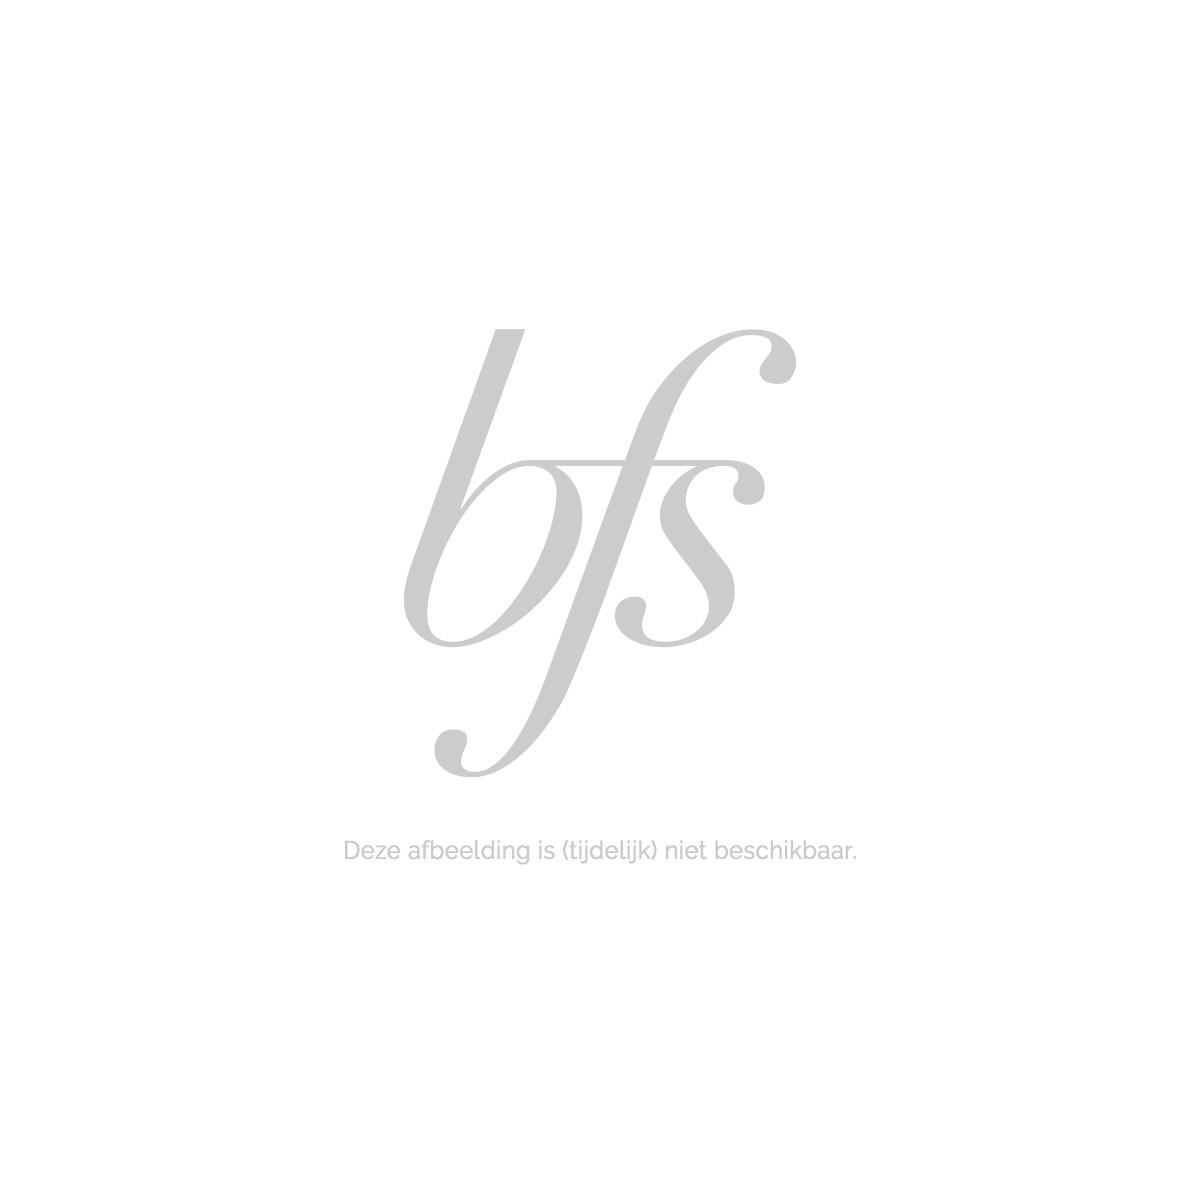 Christian Dior Capture Totale Night Restorative Creme 60 Ml